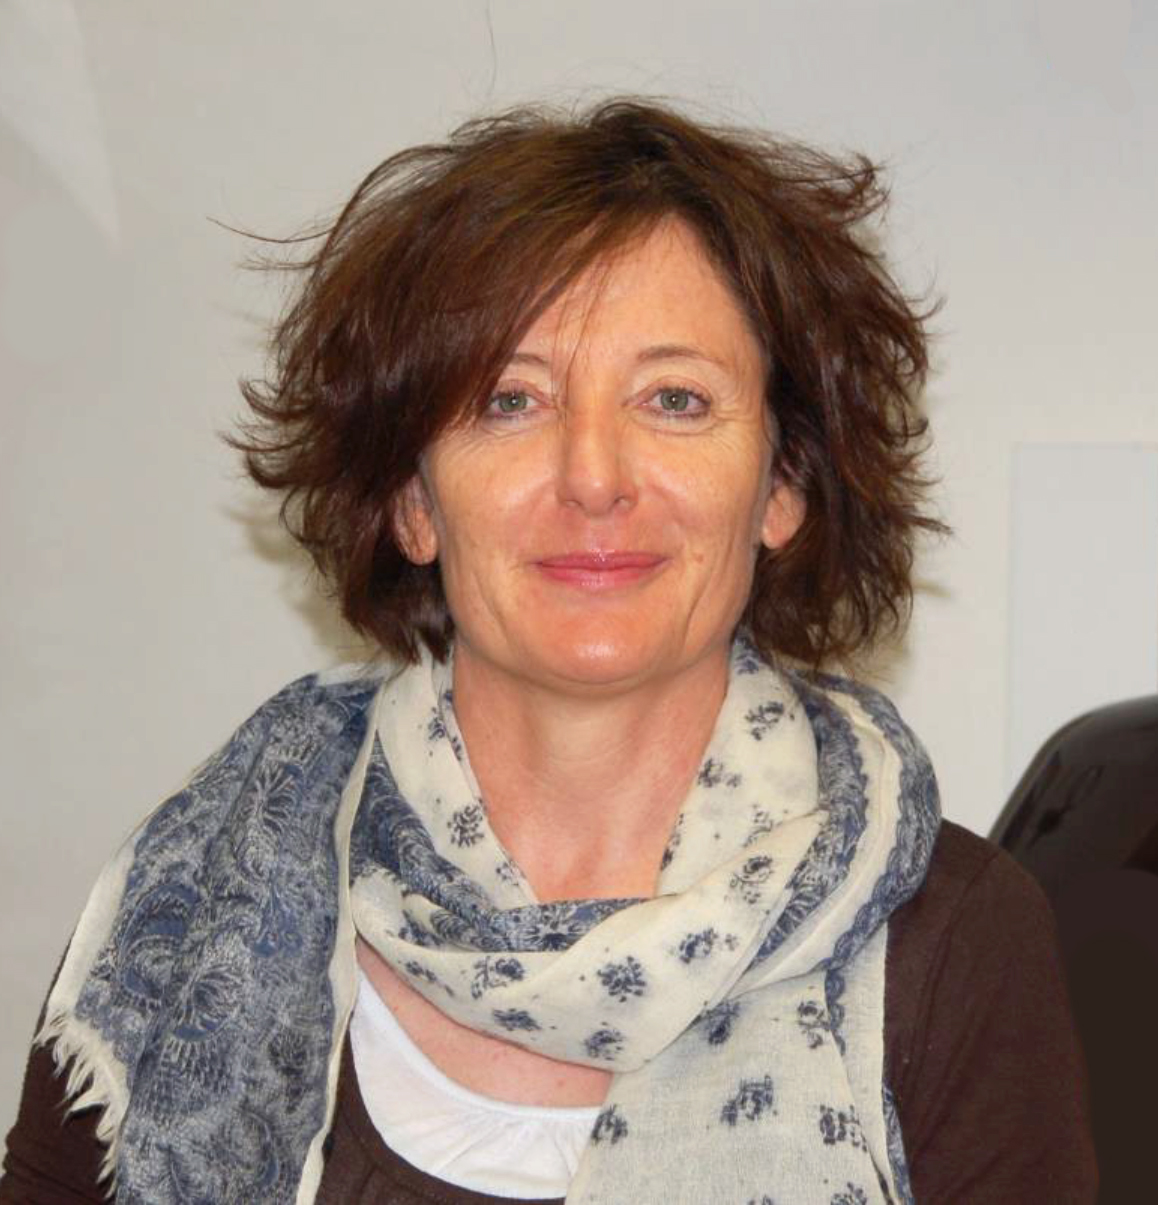 Marylène Mick-Chevallay